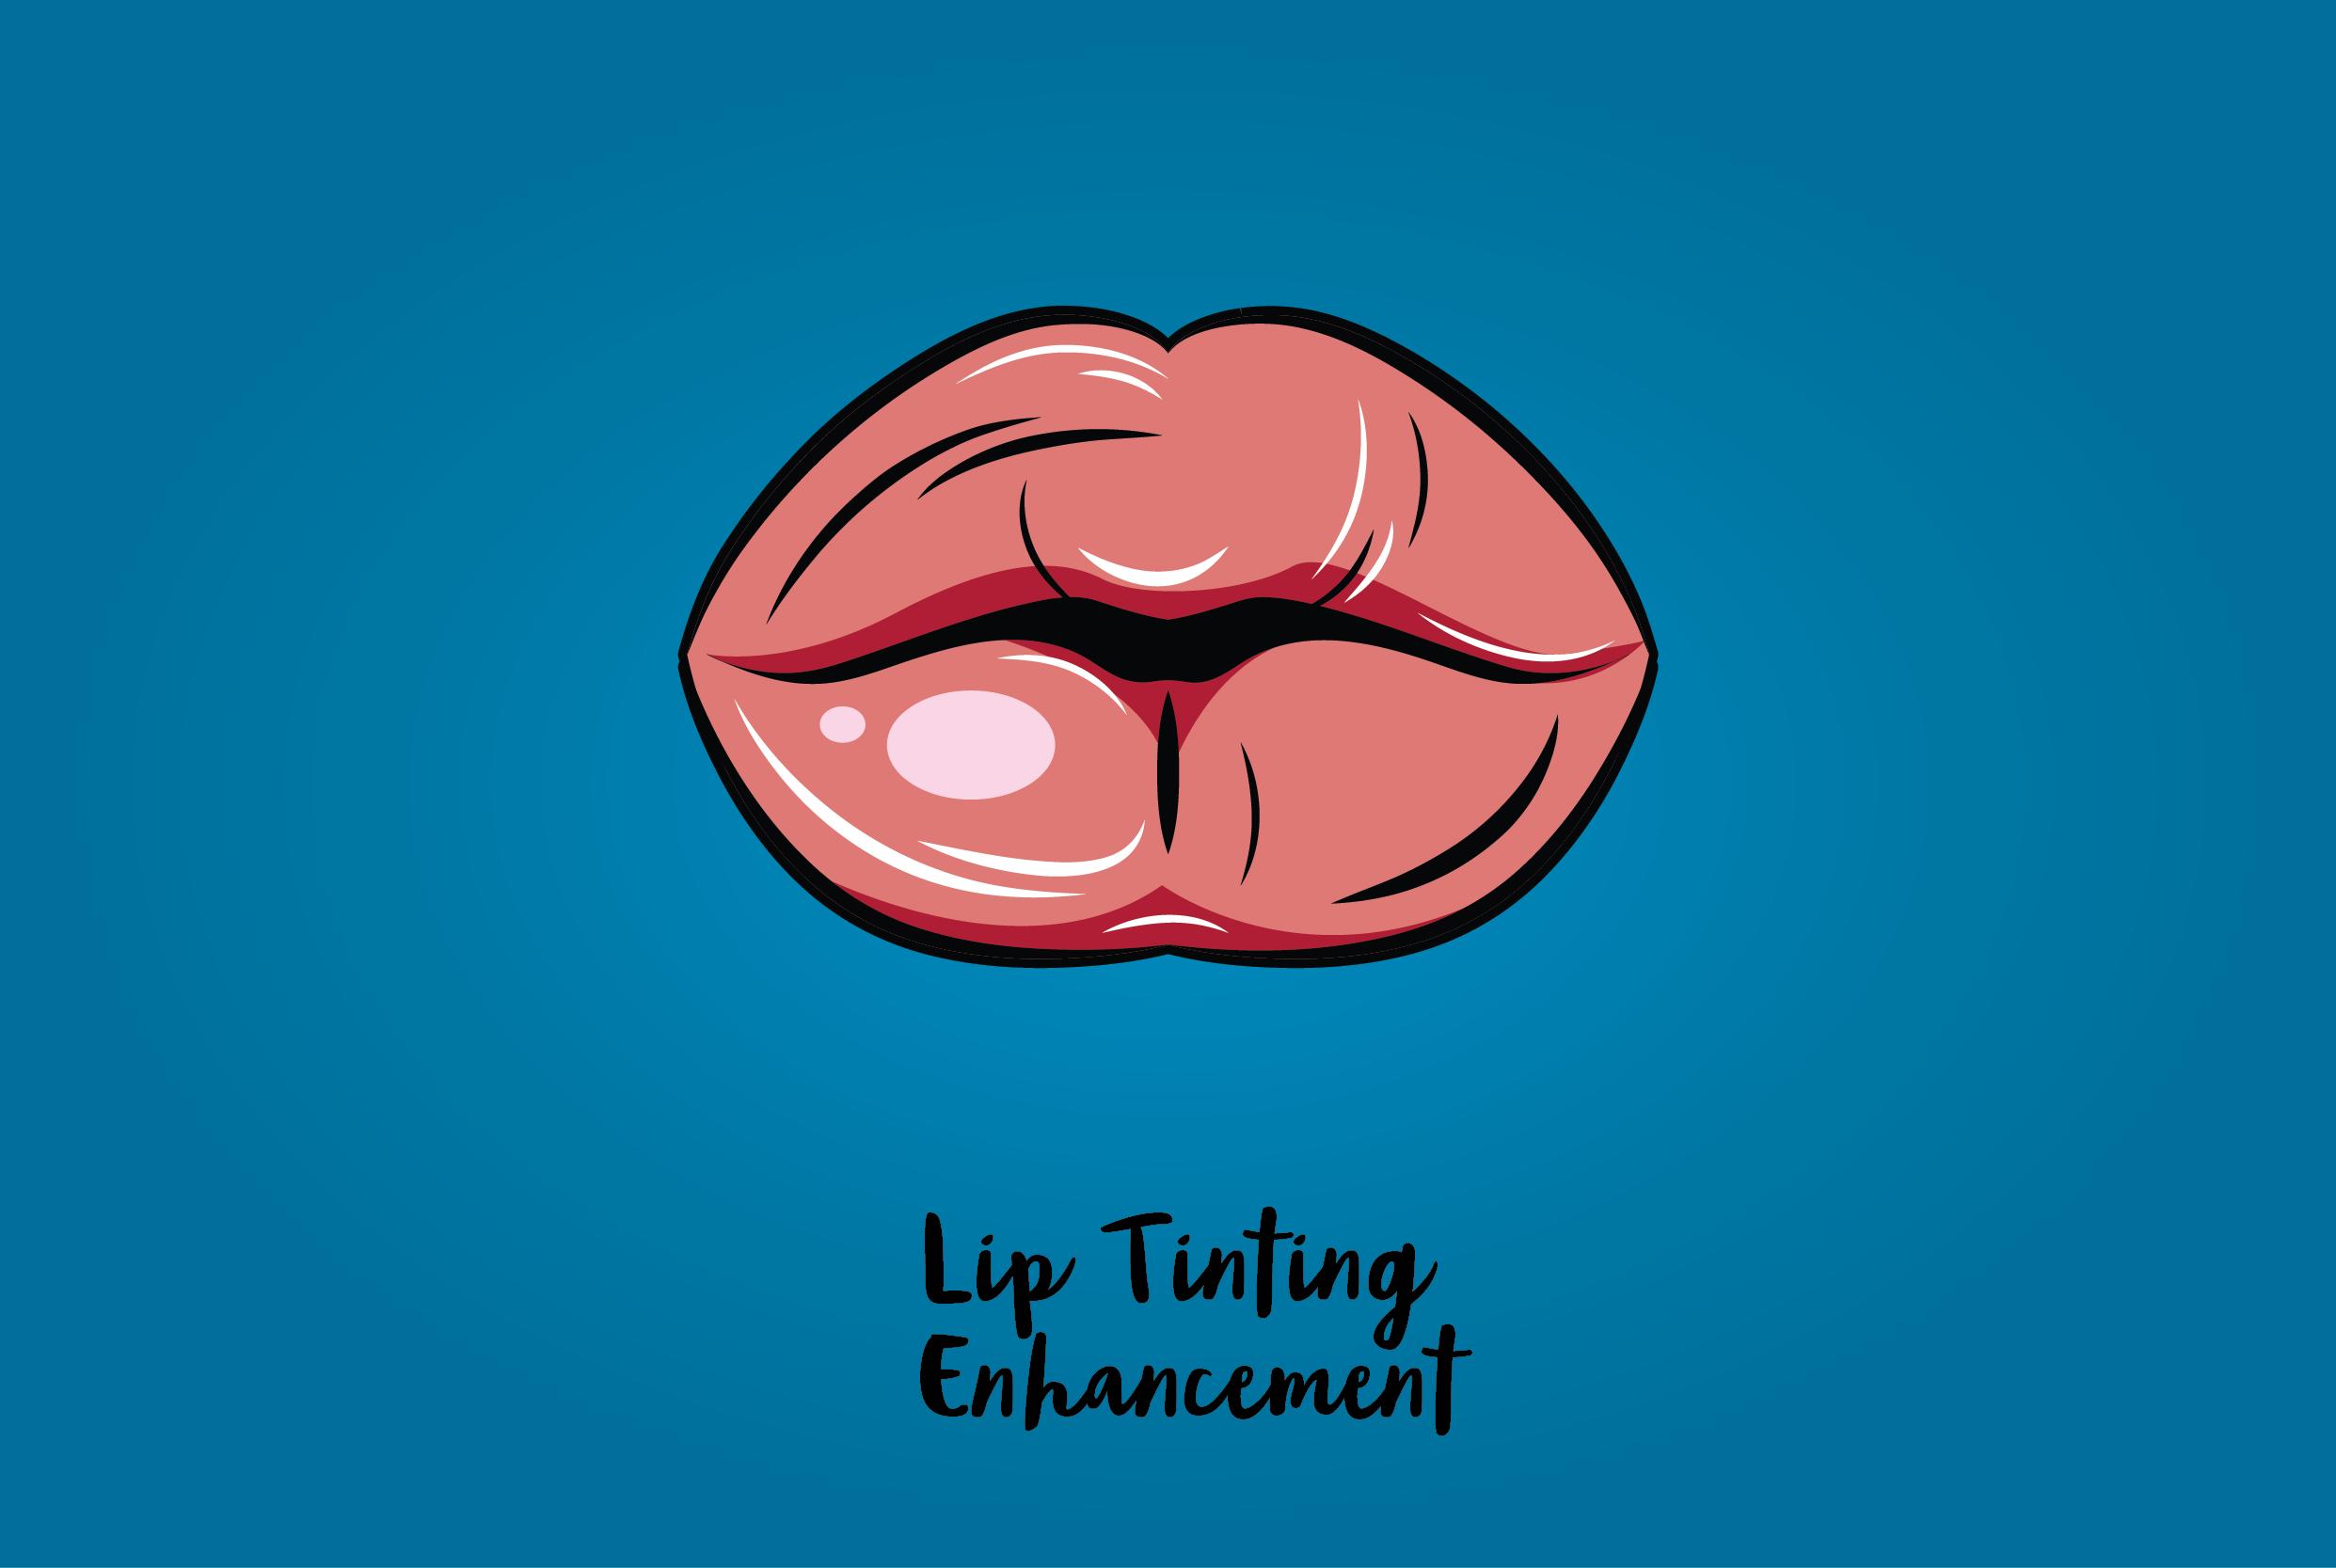 Lip Tinting Enhancement